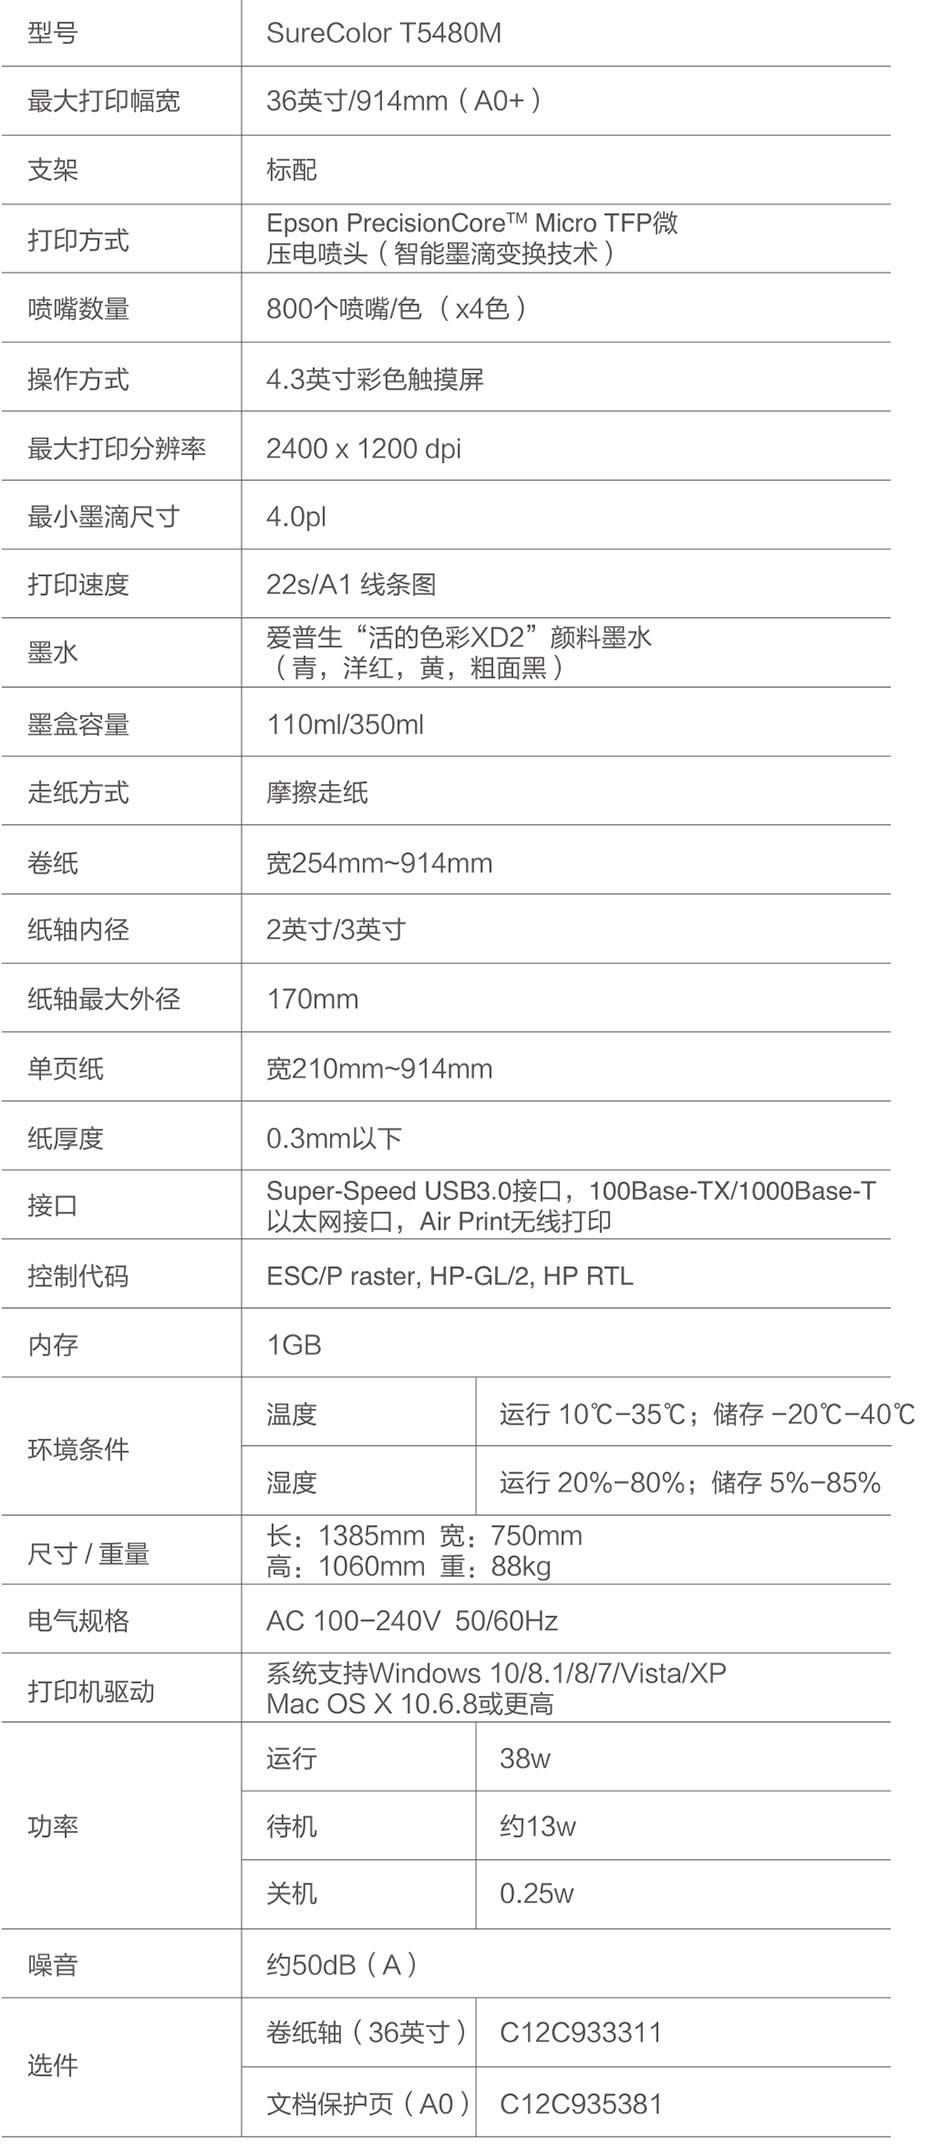 大幅面彩色喷墨打印机Epson-SureColor-T5480M产品参数